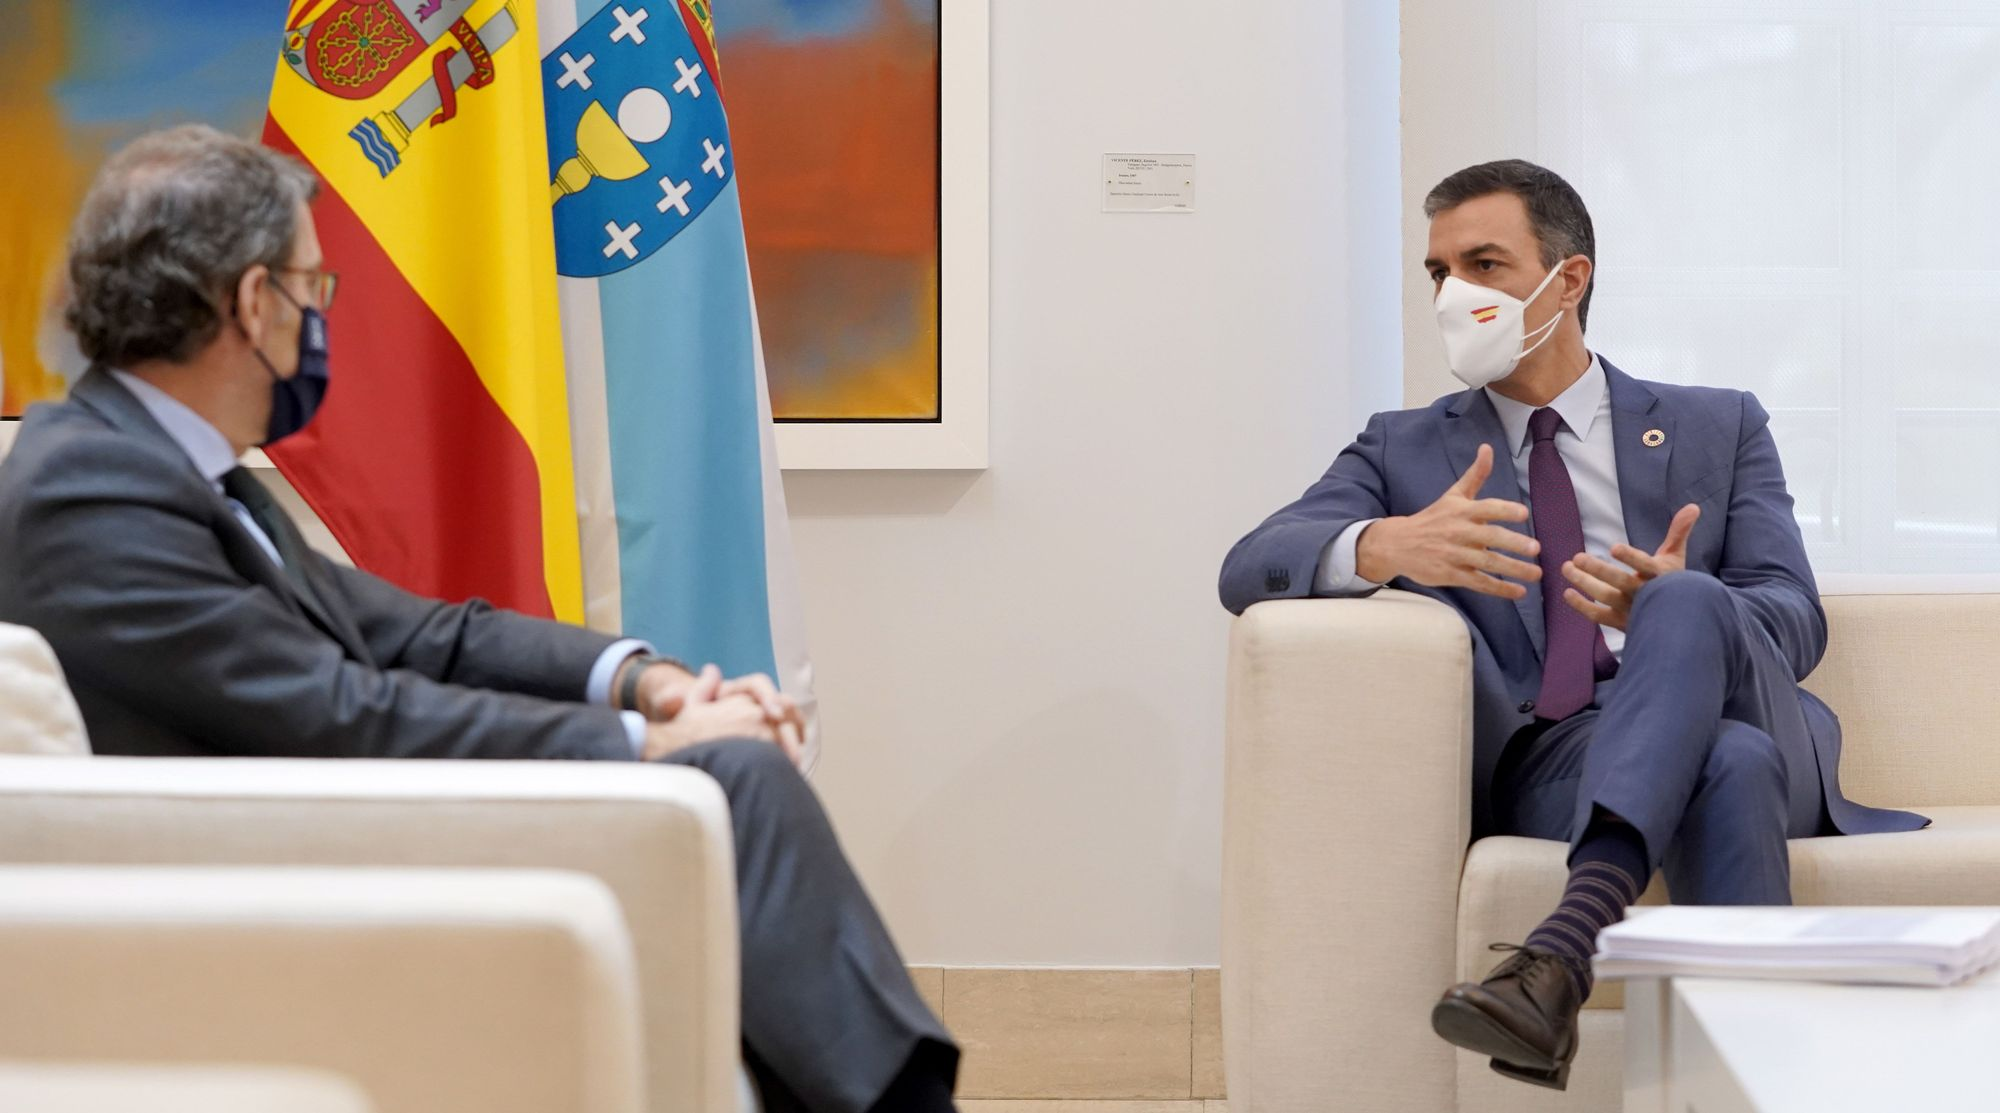 Reunión en Moncloa de Pedro Sánchez y Alberto Núñez Feijóo